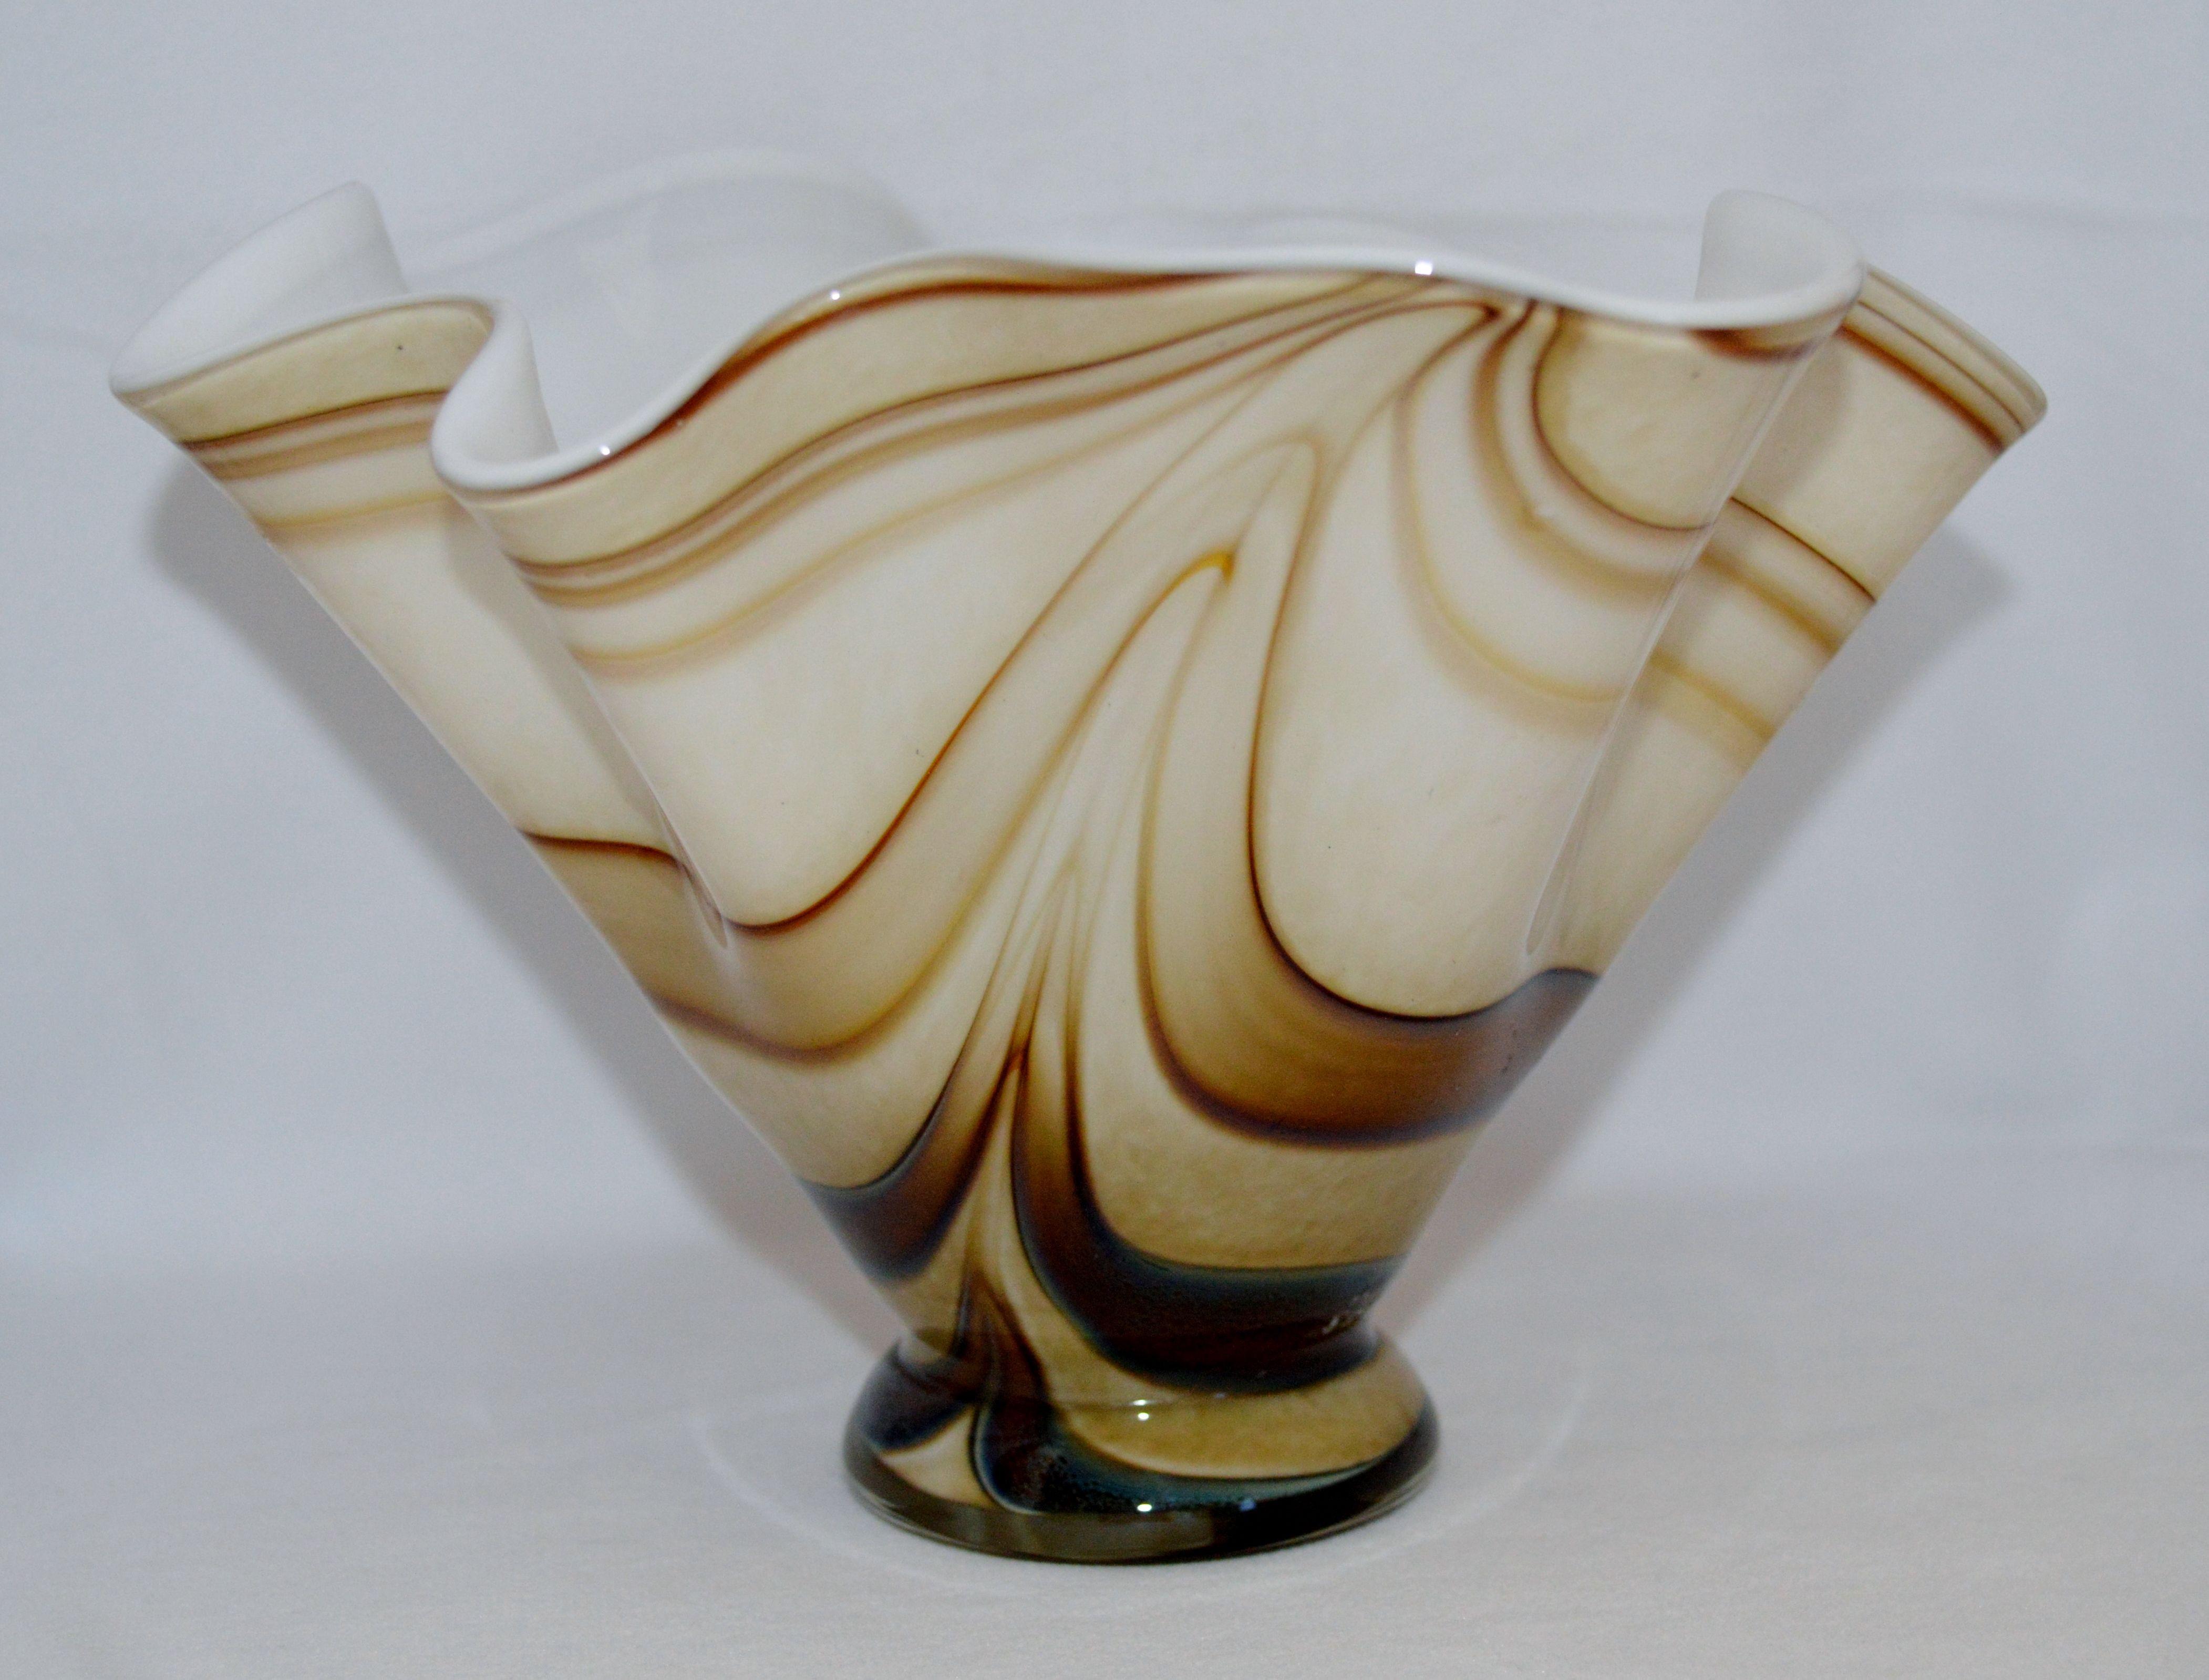 krosno poland glass vase of krosno polish makora glass vase hand blown artisan by jozefino pertaining to krosno polish makora glass vase hand blown artisan by jozefino